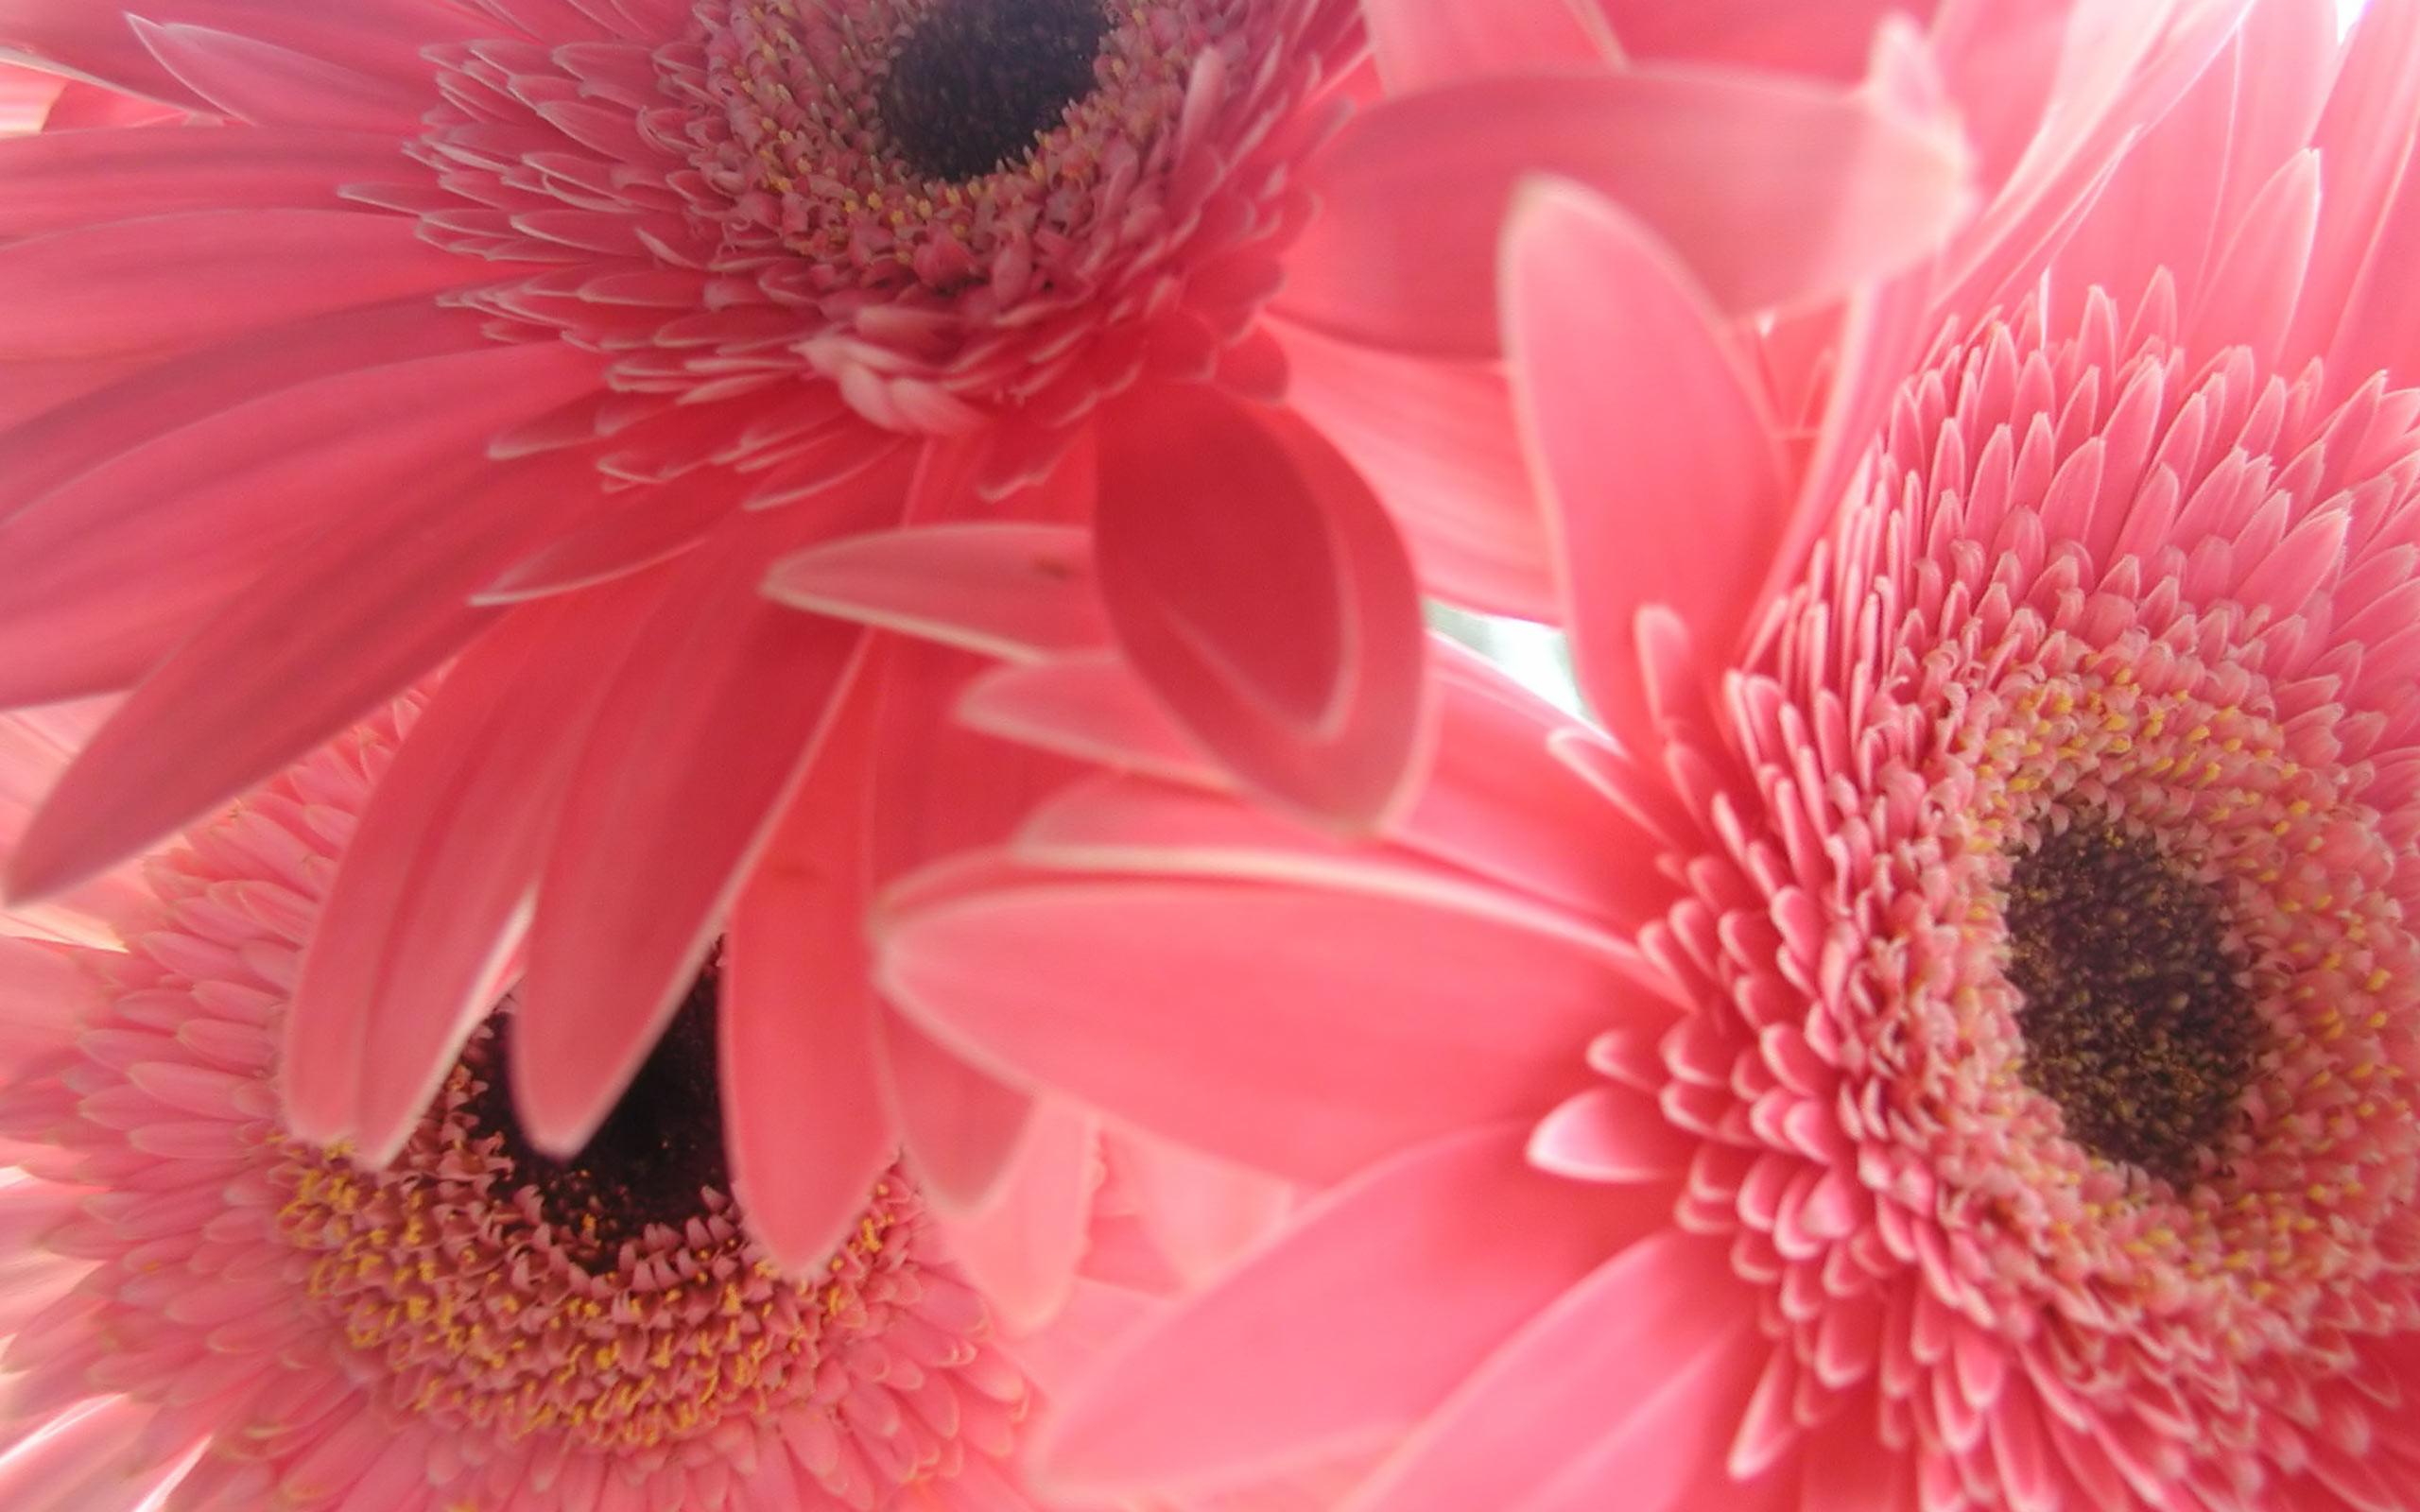 pink desktop wallpaper themes (47+ images)